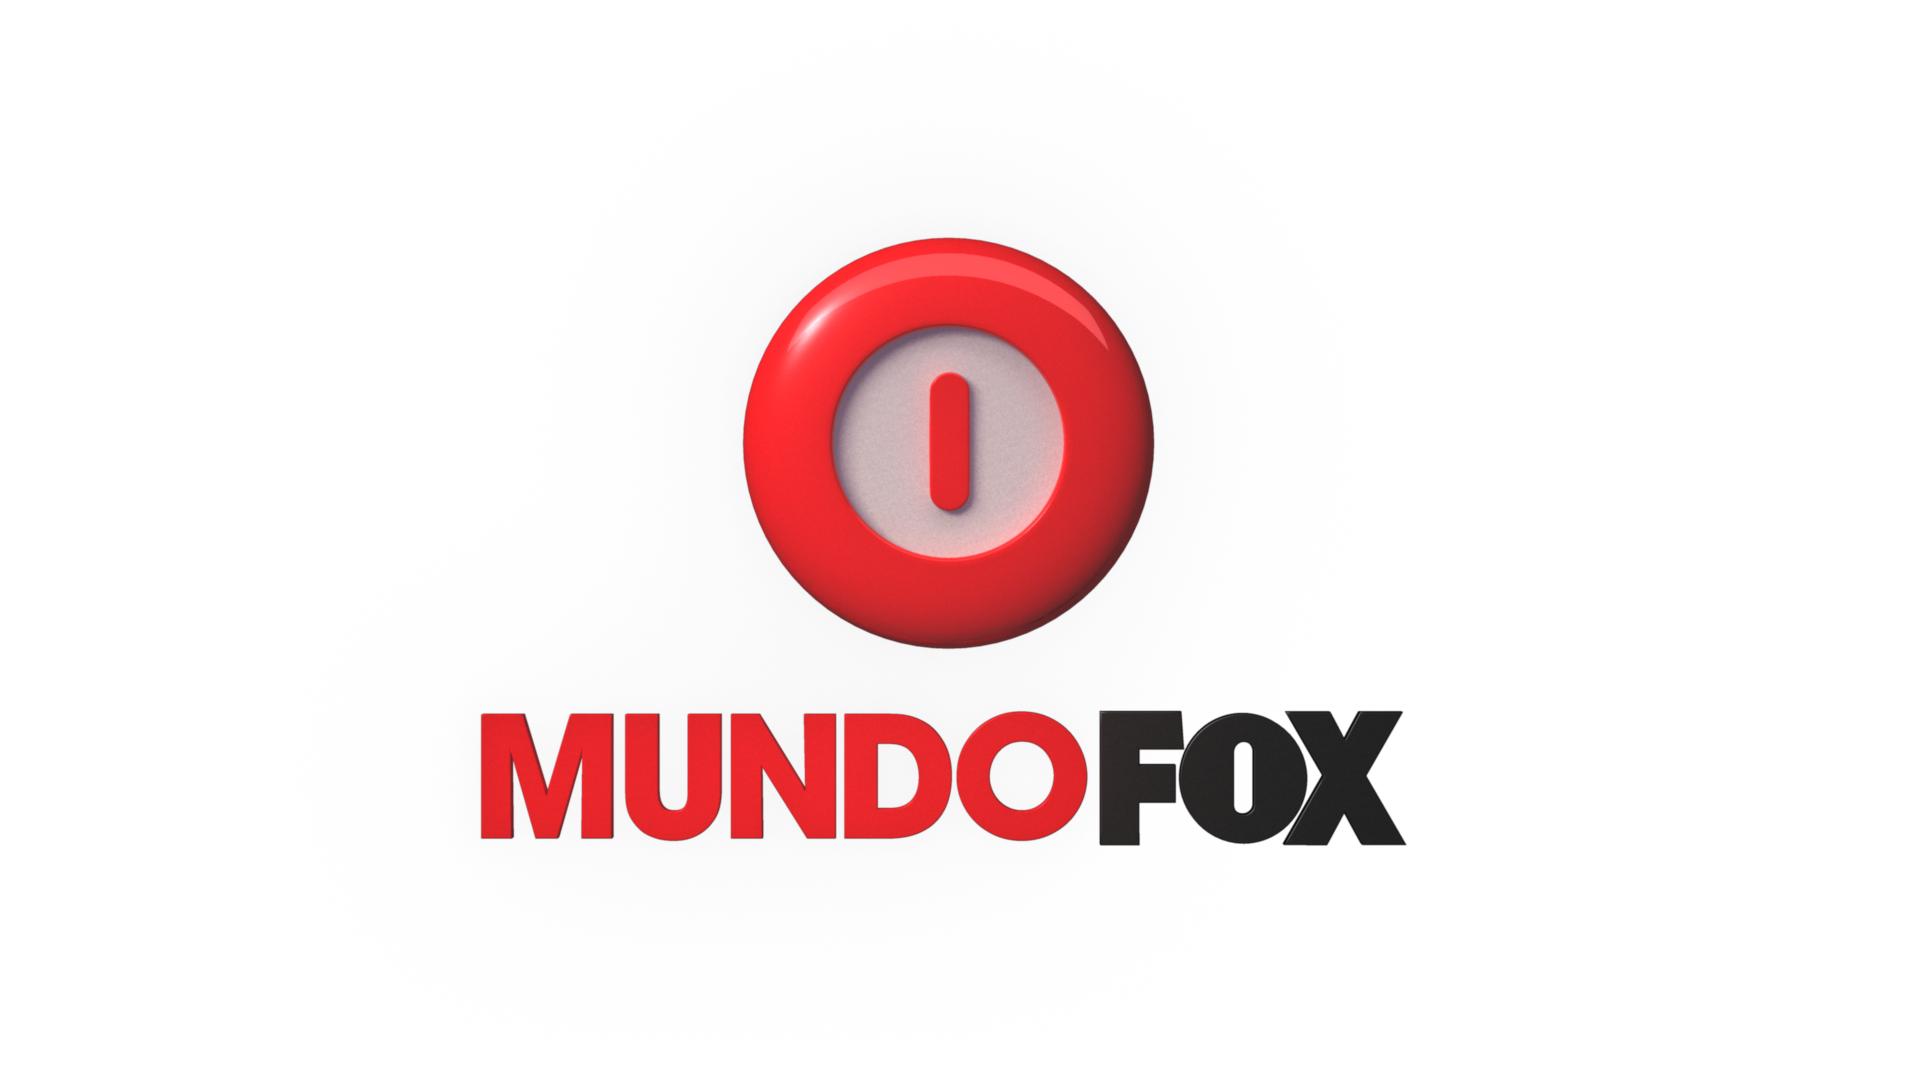 mundoFOX Logo photo - 1